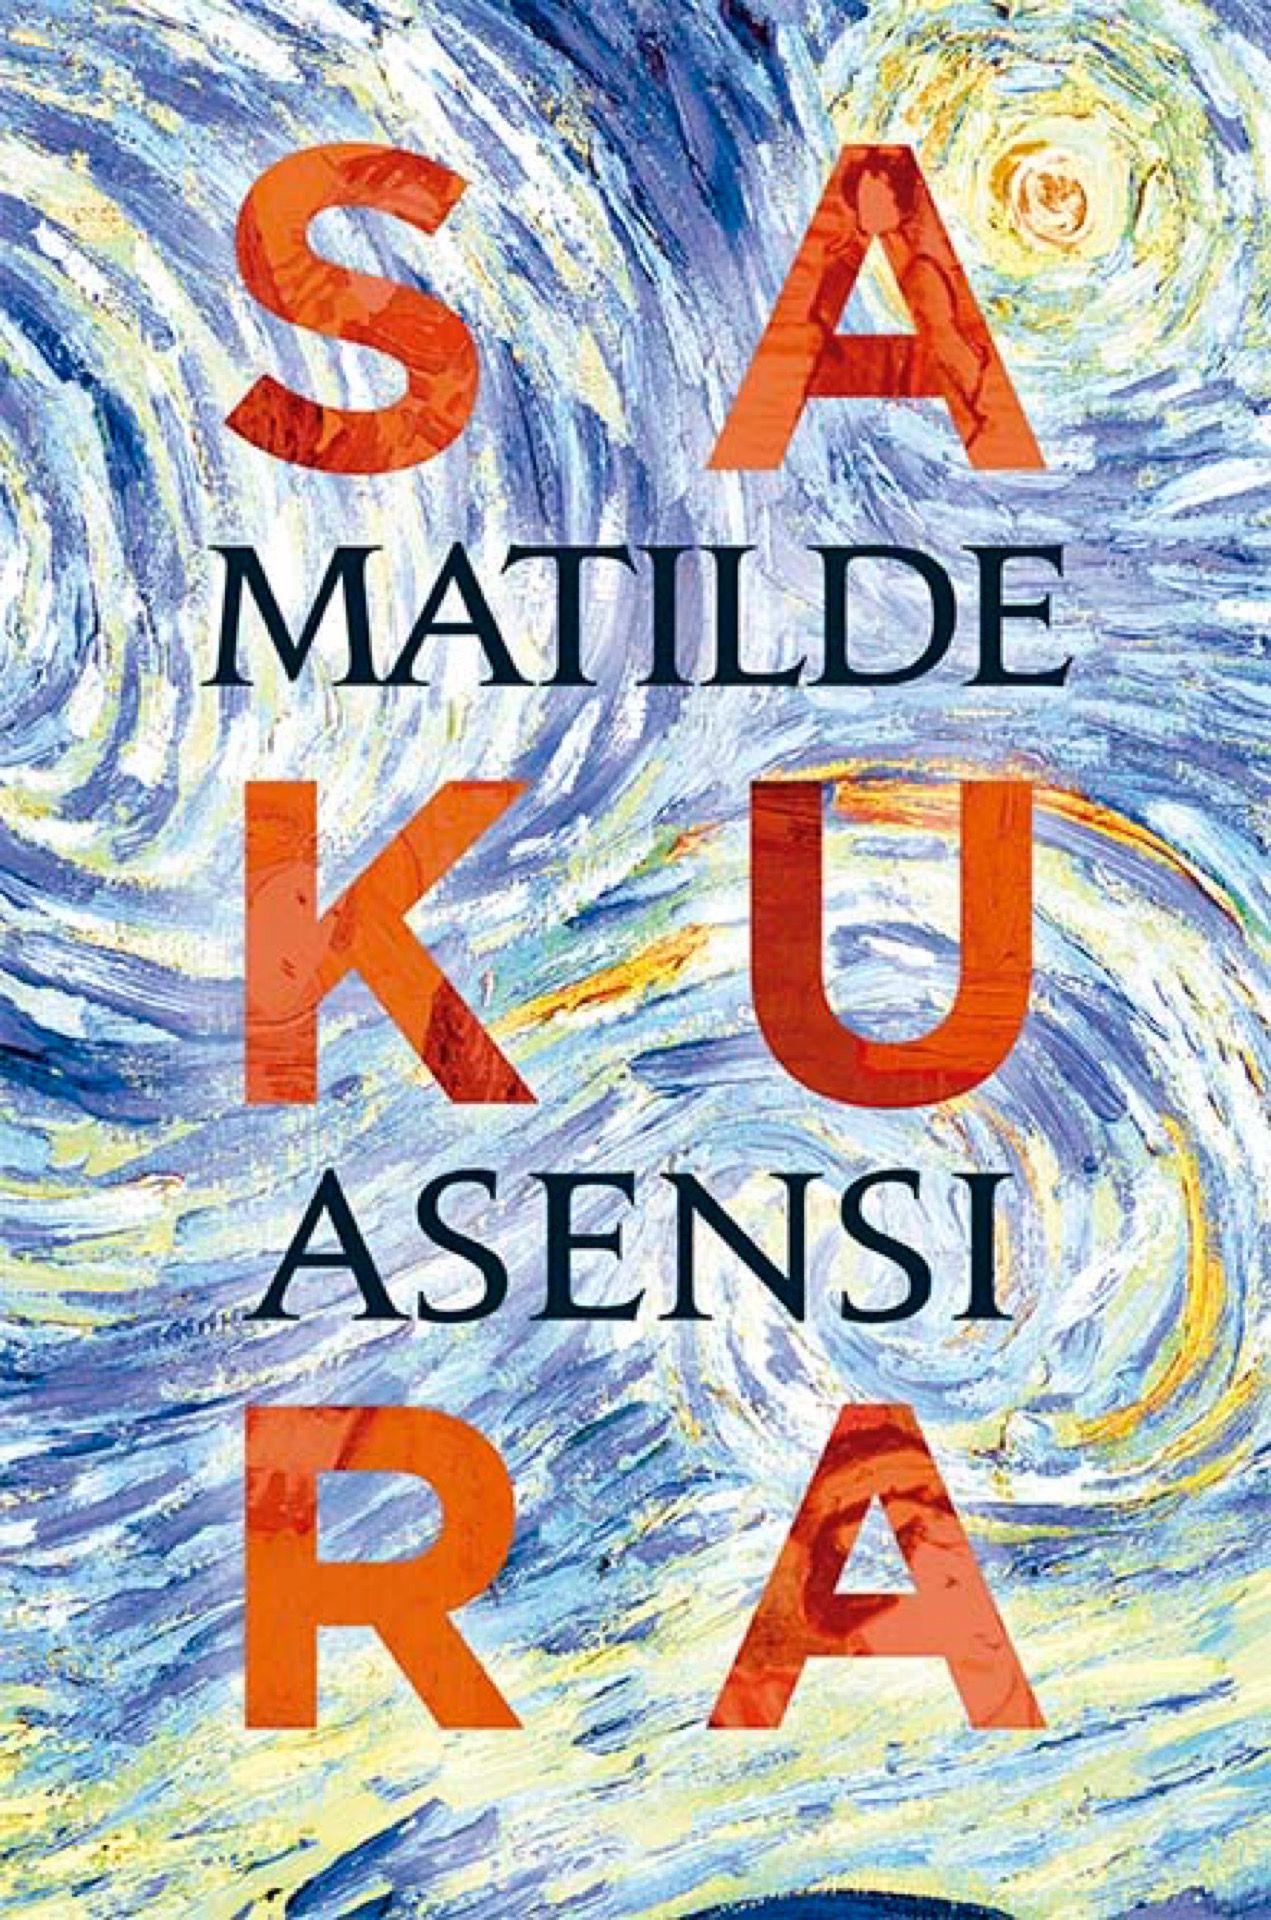 La tapa de Sakura de Matilde Asensi, una escritora española best-seller.